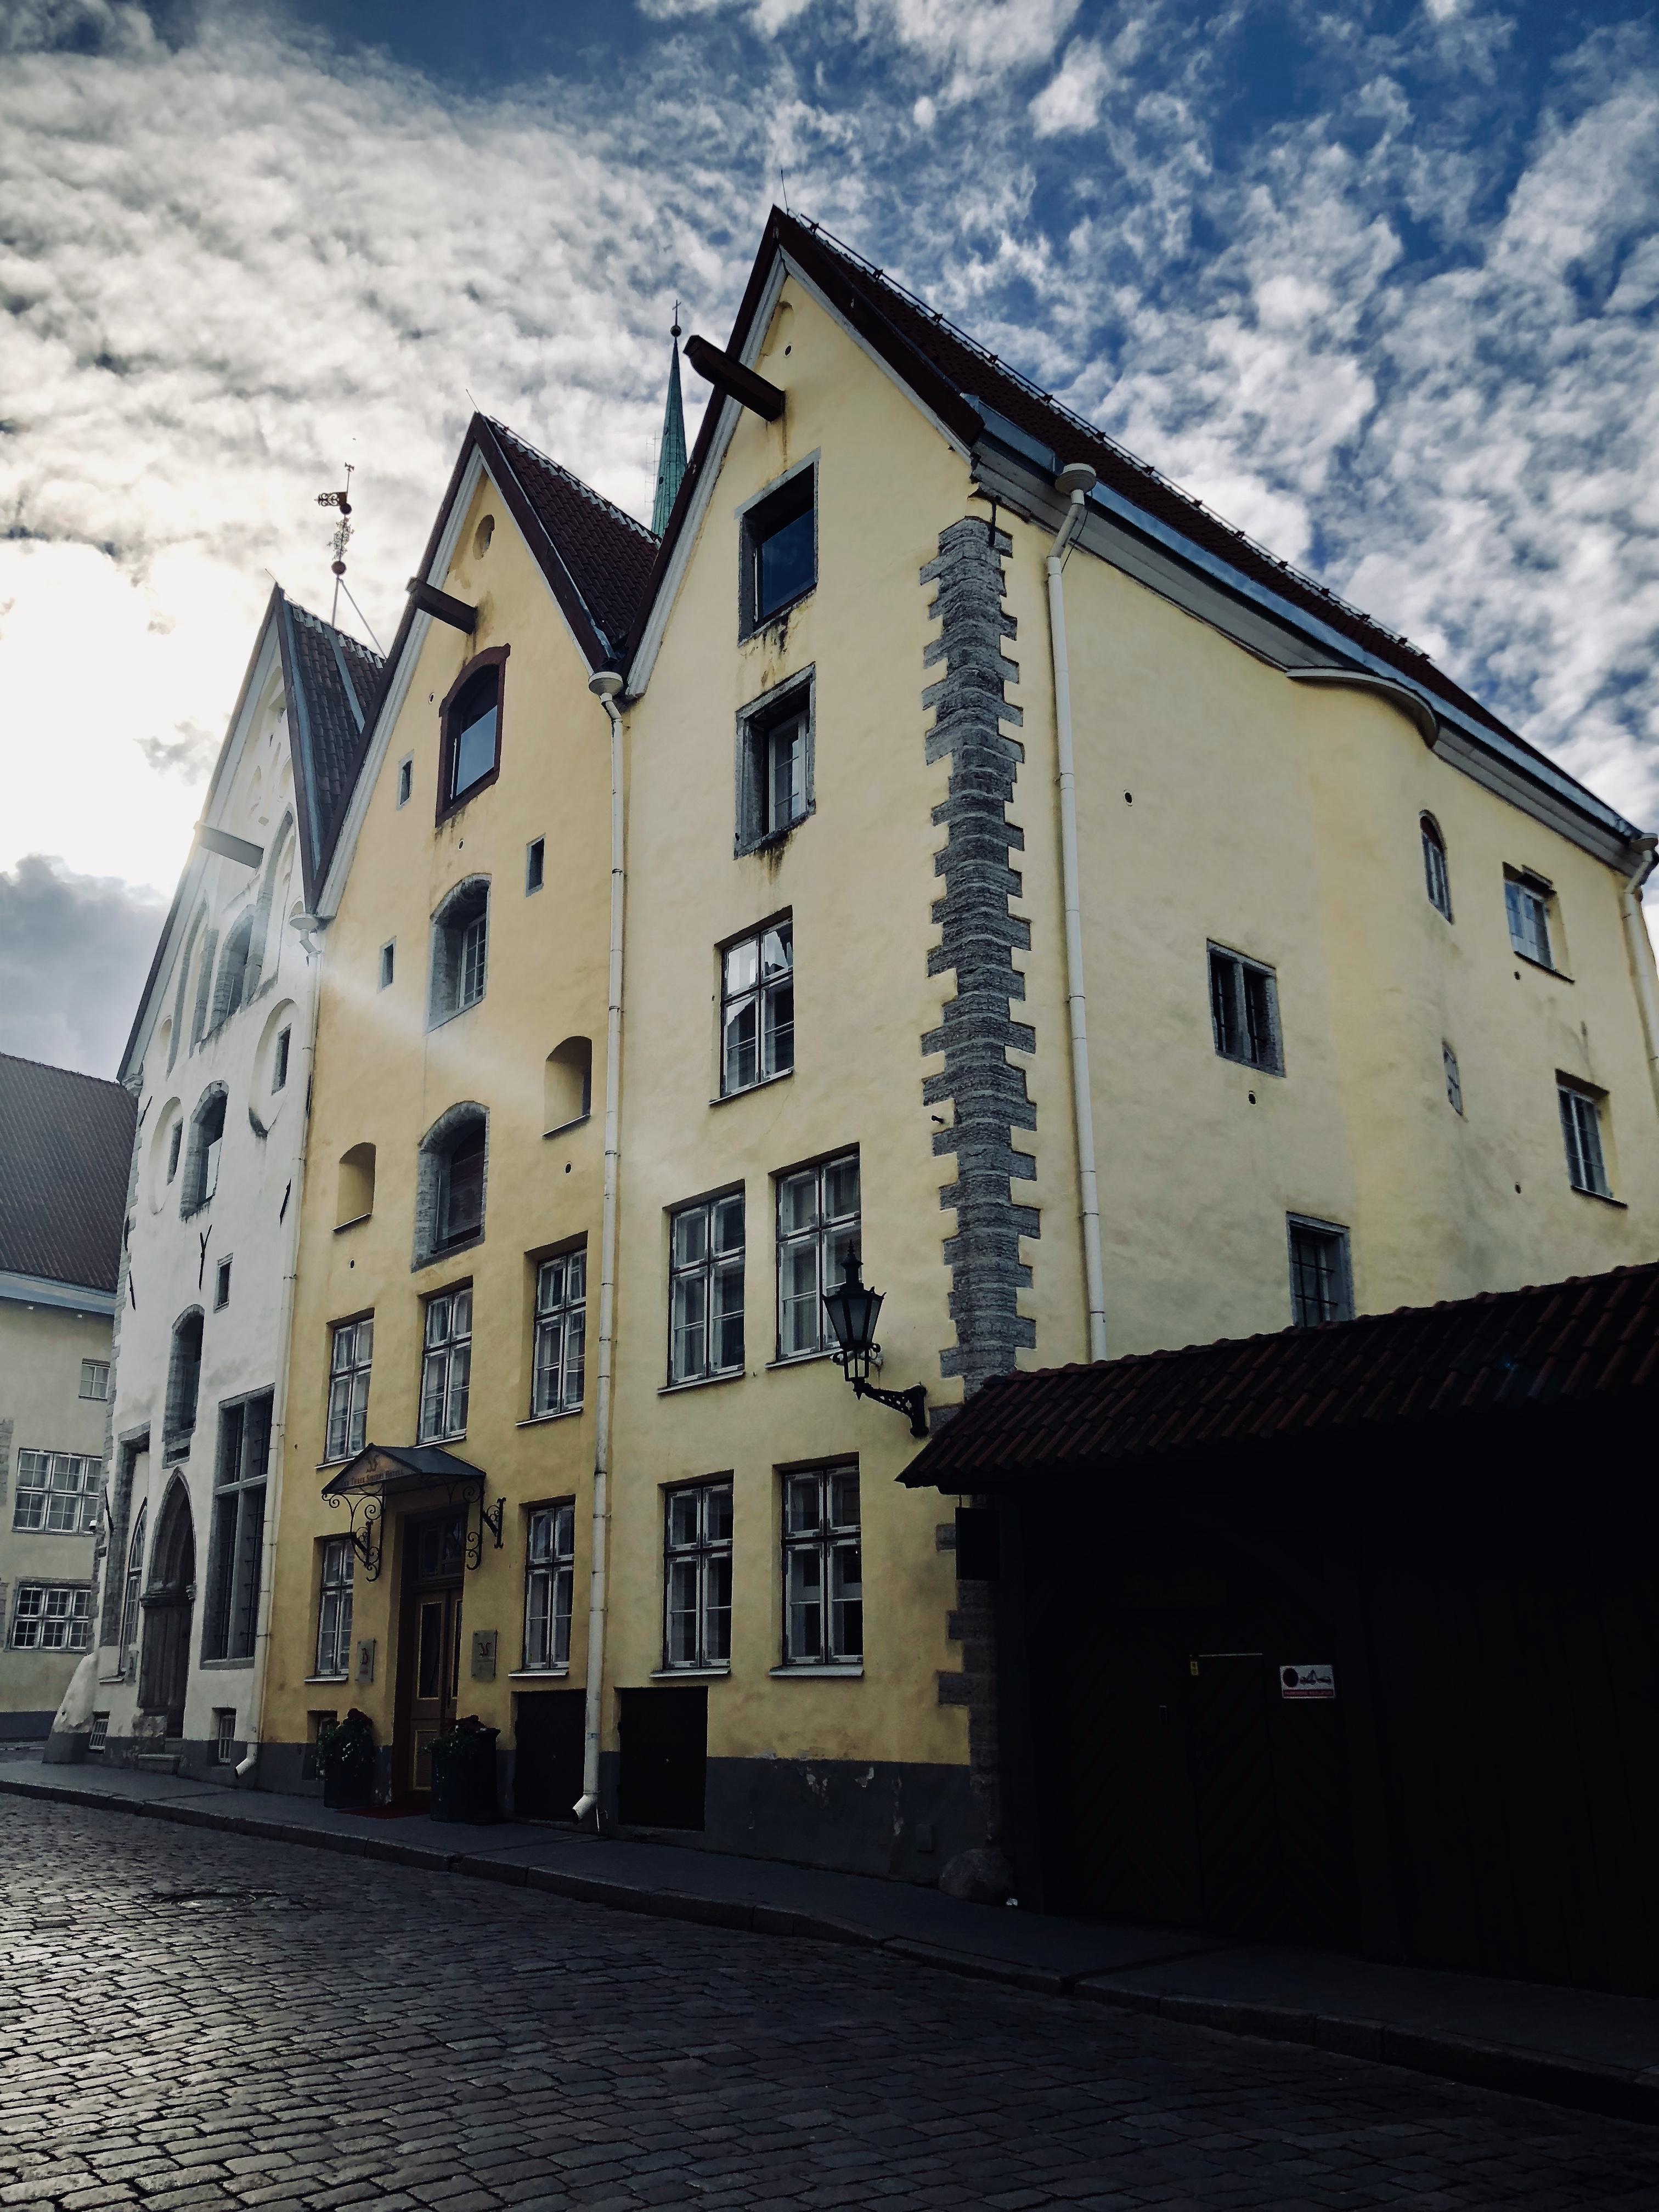 Travel Diary 48 Stunden in Tallinn Three Sisters Hotel